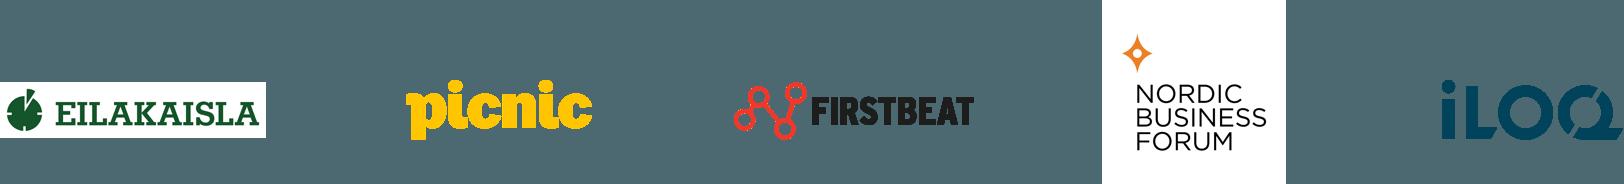 Asiakkaitamme - Eilakaisla - Picnic - Firstbeat - Nordic Business Forum - iLoq